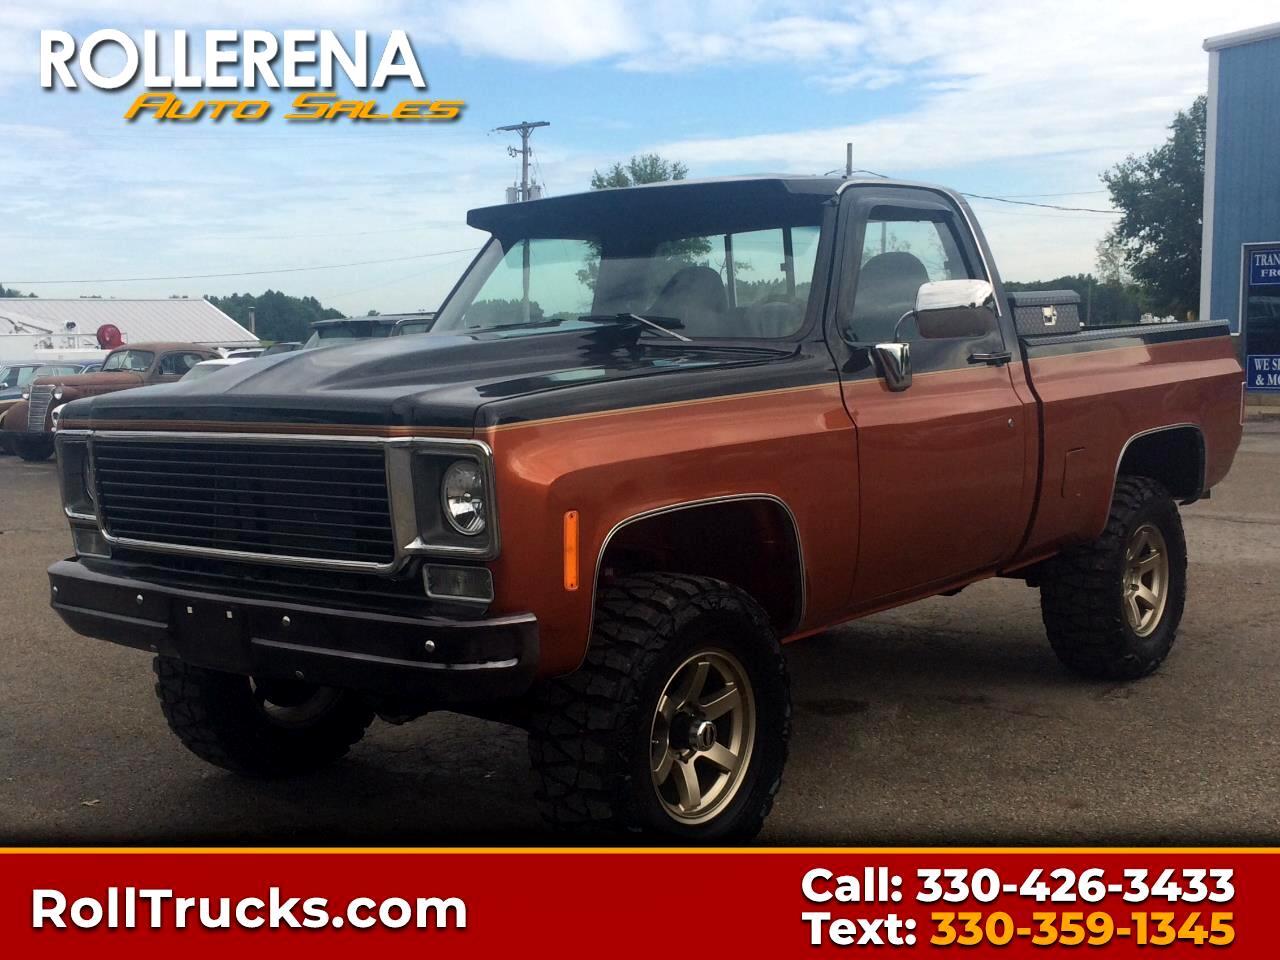 1976 Chevrolet SILVERADO Pickup Truck